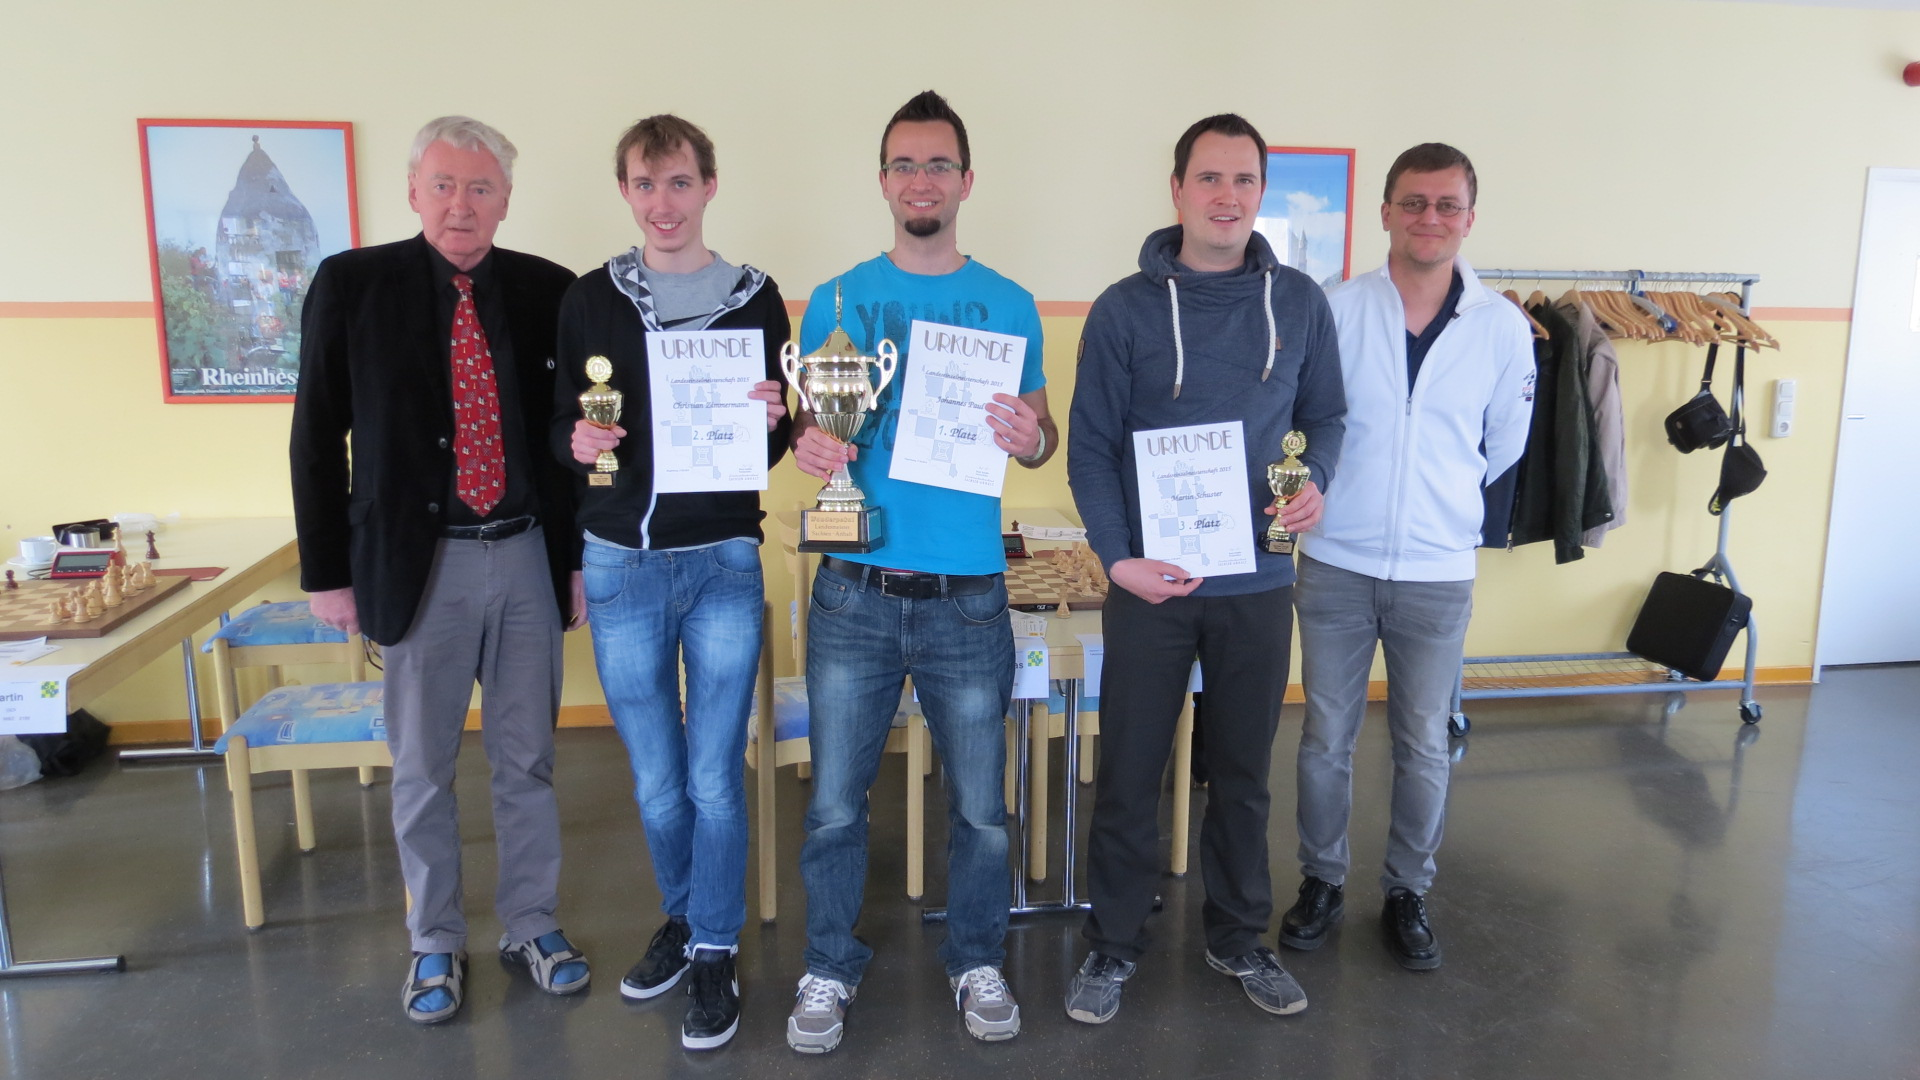 LEM 2015: Präsident Dr. Günter Reinemann, Christian Zimmermann (2.), Johannes Paul (1.), Martin Schuster (3.), Turnierleiter Reyk Schäfer